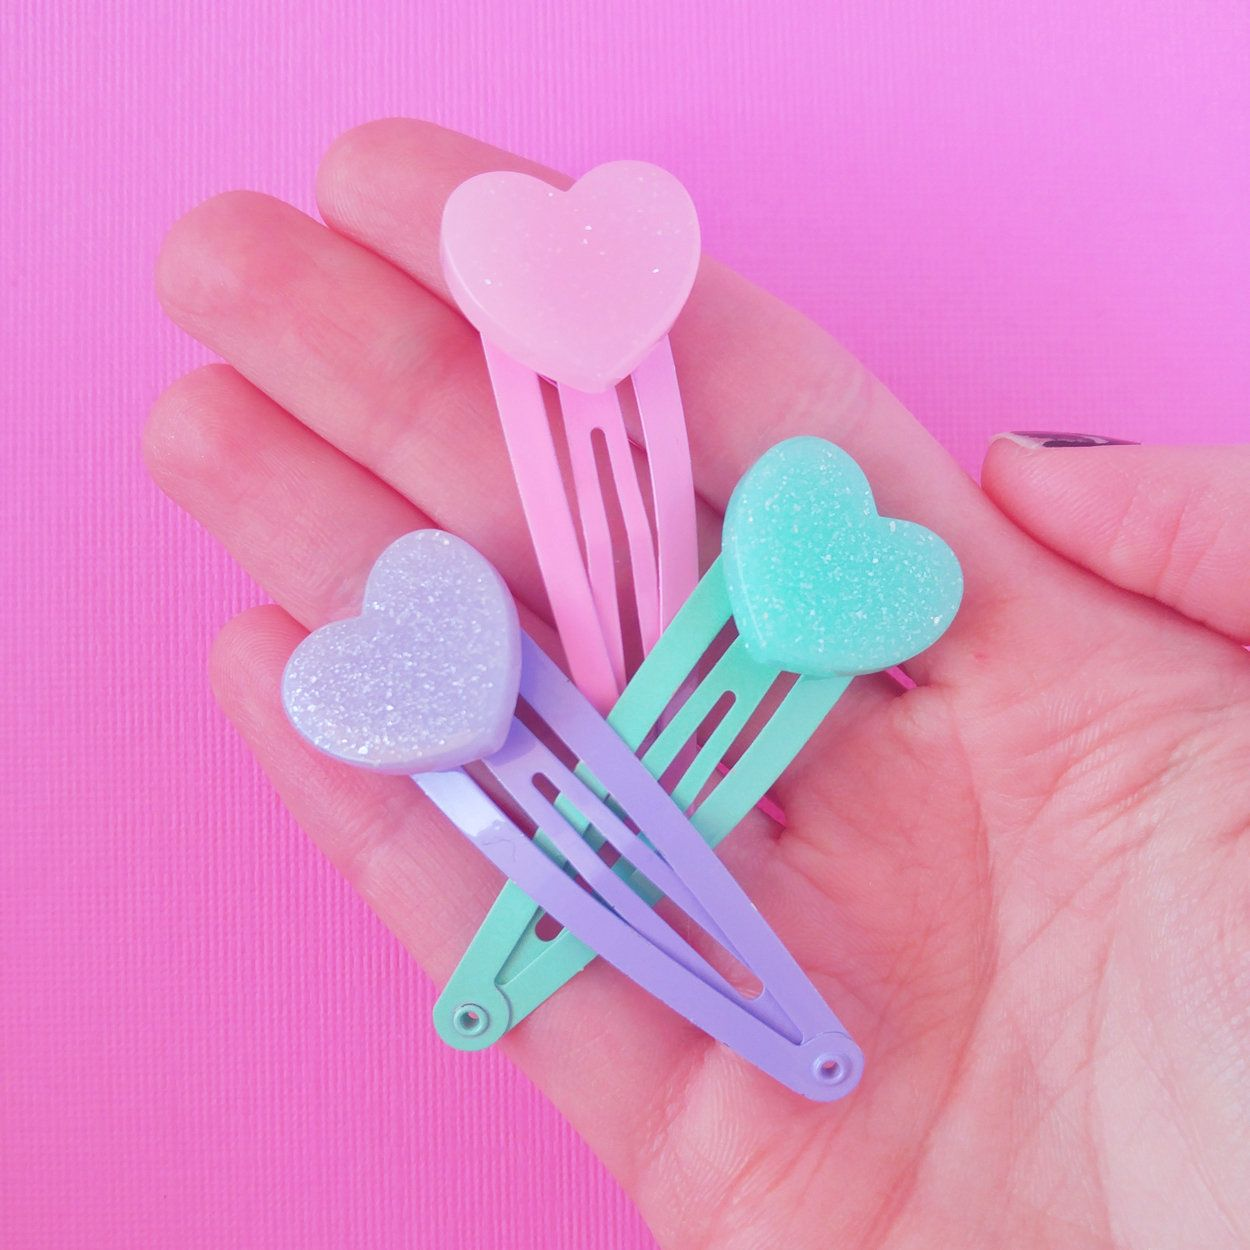 Cute Heart Hair Clip Set Kawaii Pastel Pink Purple Teal Fairy Kei Hair Clips Set Of 3 Kawaii Hair Clips Kawaii Hair Accessories Kawaii Hairstyles